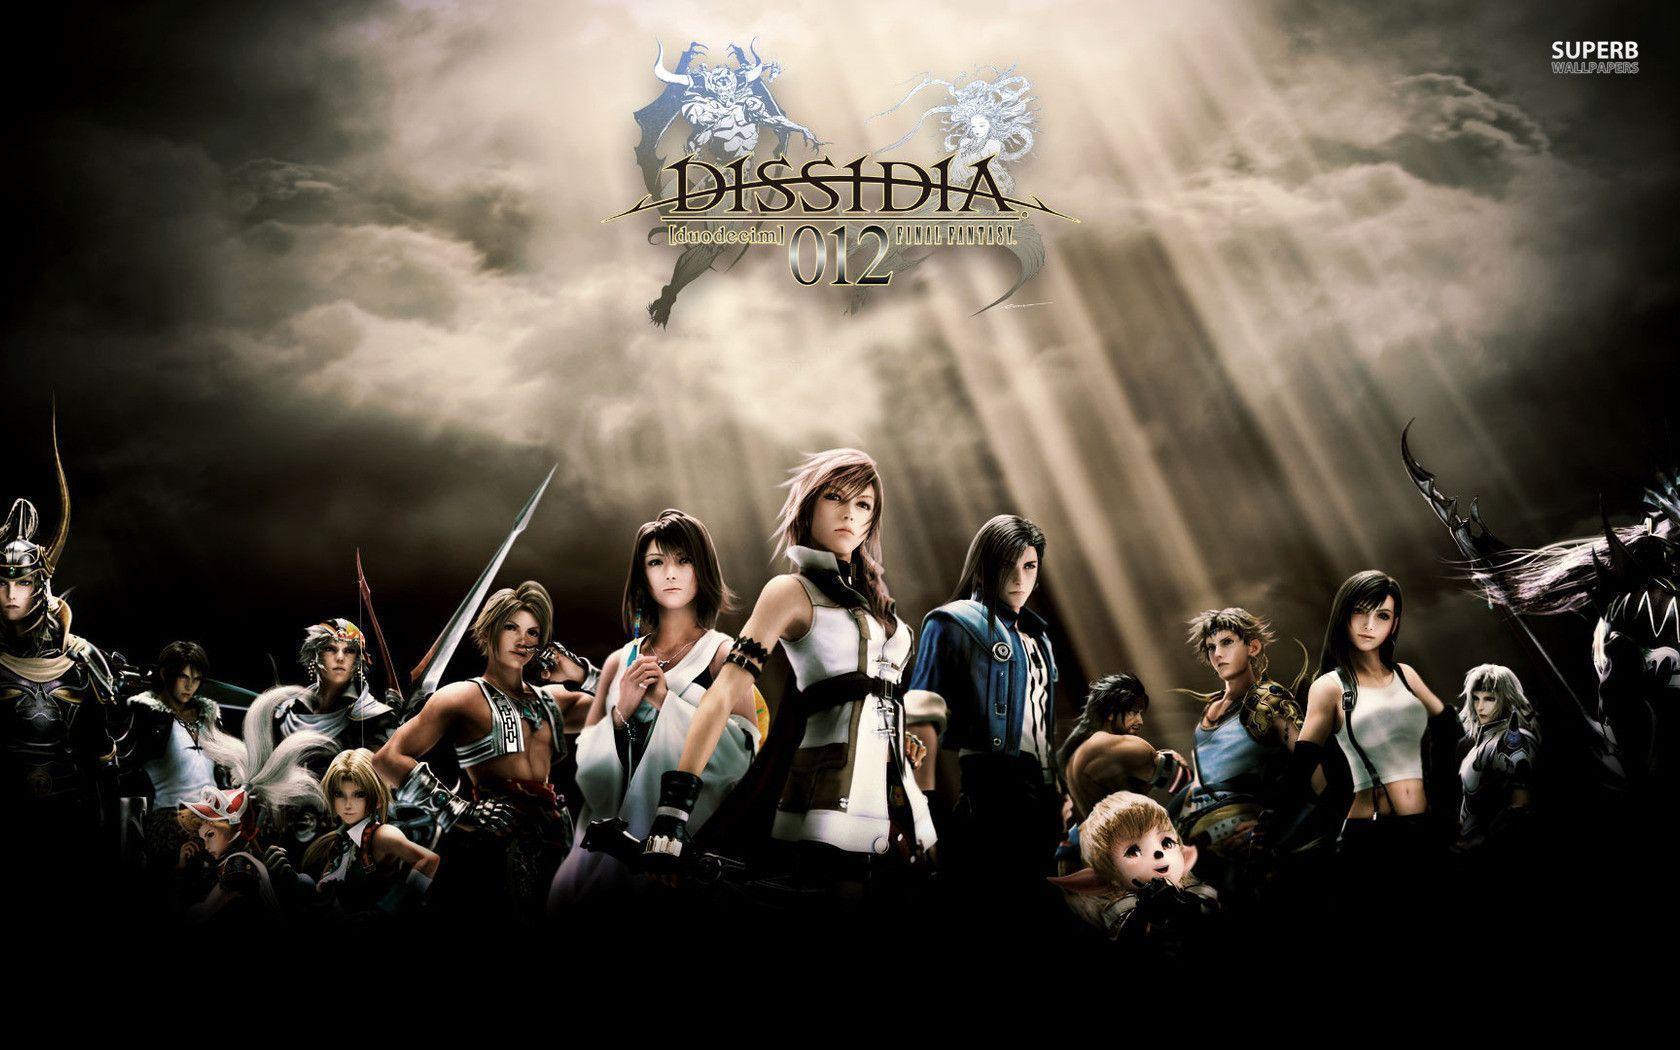 2560x1080 Final Fantasy Xv Artwork 2560x1080 Resolution Hd: Final Fantasy Dissidia Wallpapers